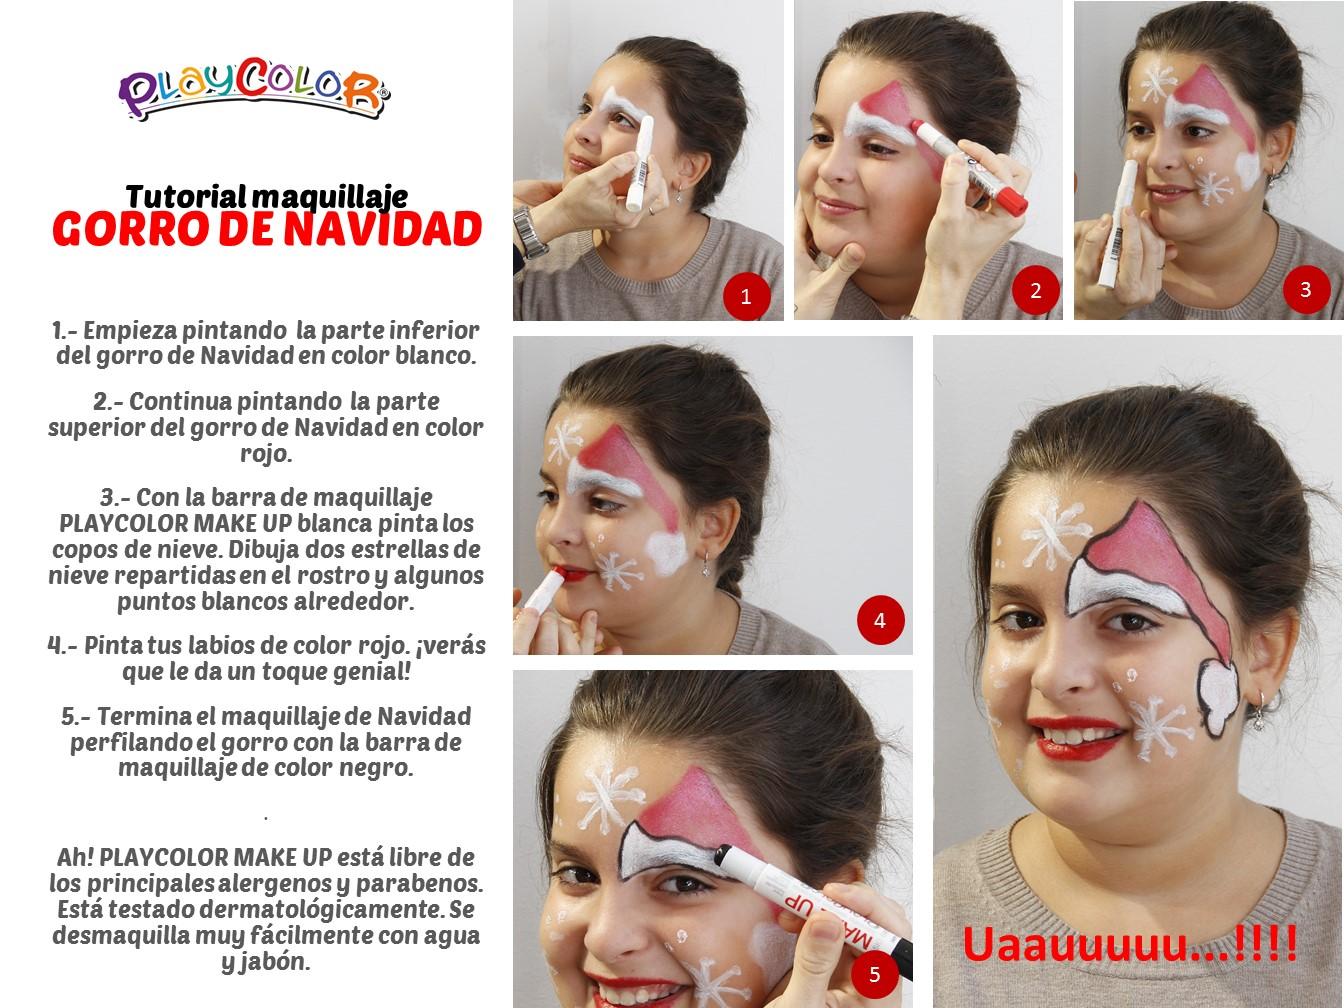 Maquillaje infantil de Navidad